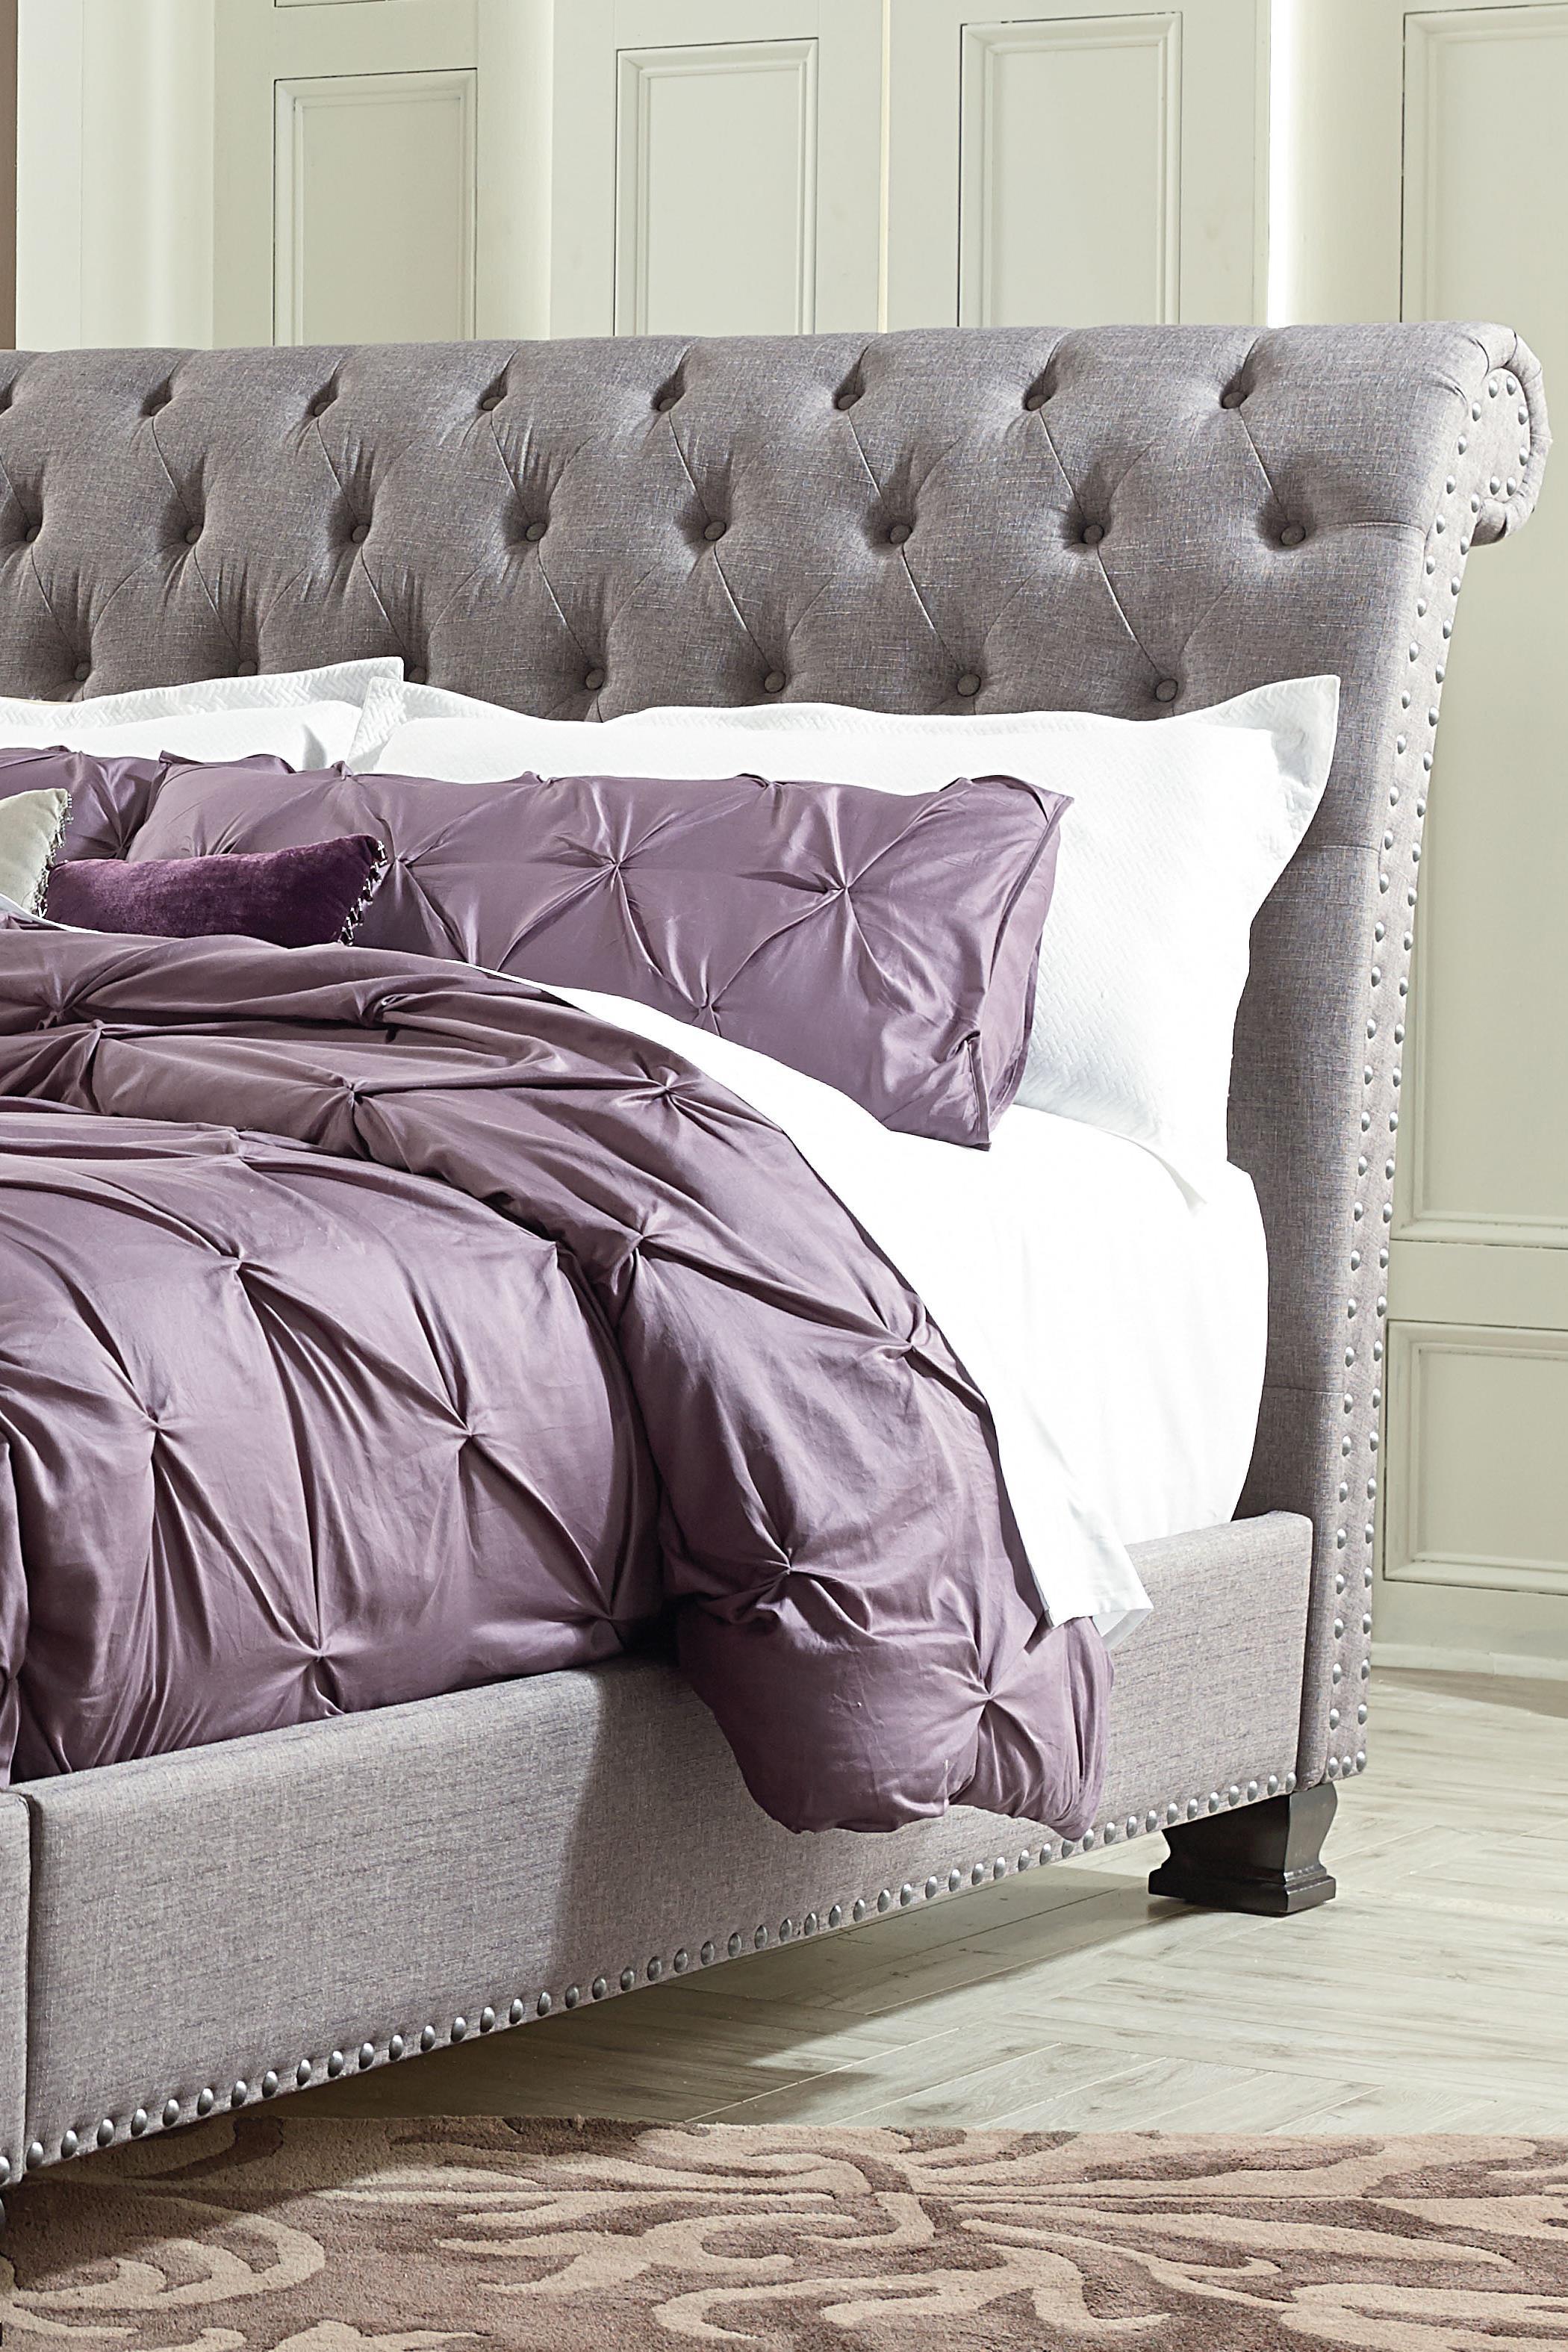 Standard Furniture Garrison Queen Traditional Upholstered Bed | Wayside  Furniture | Upholstered Beds